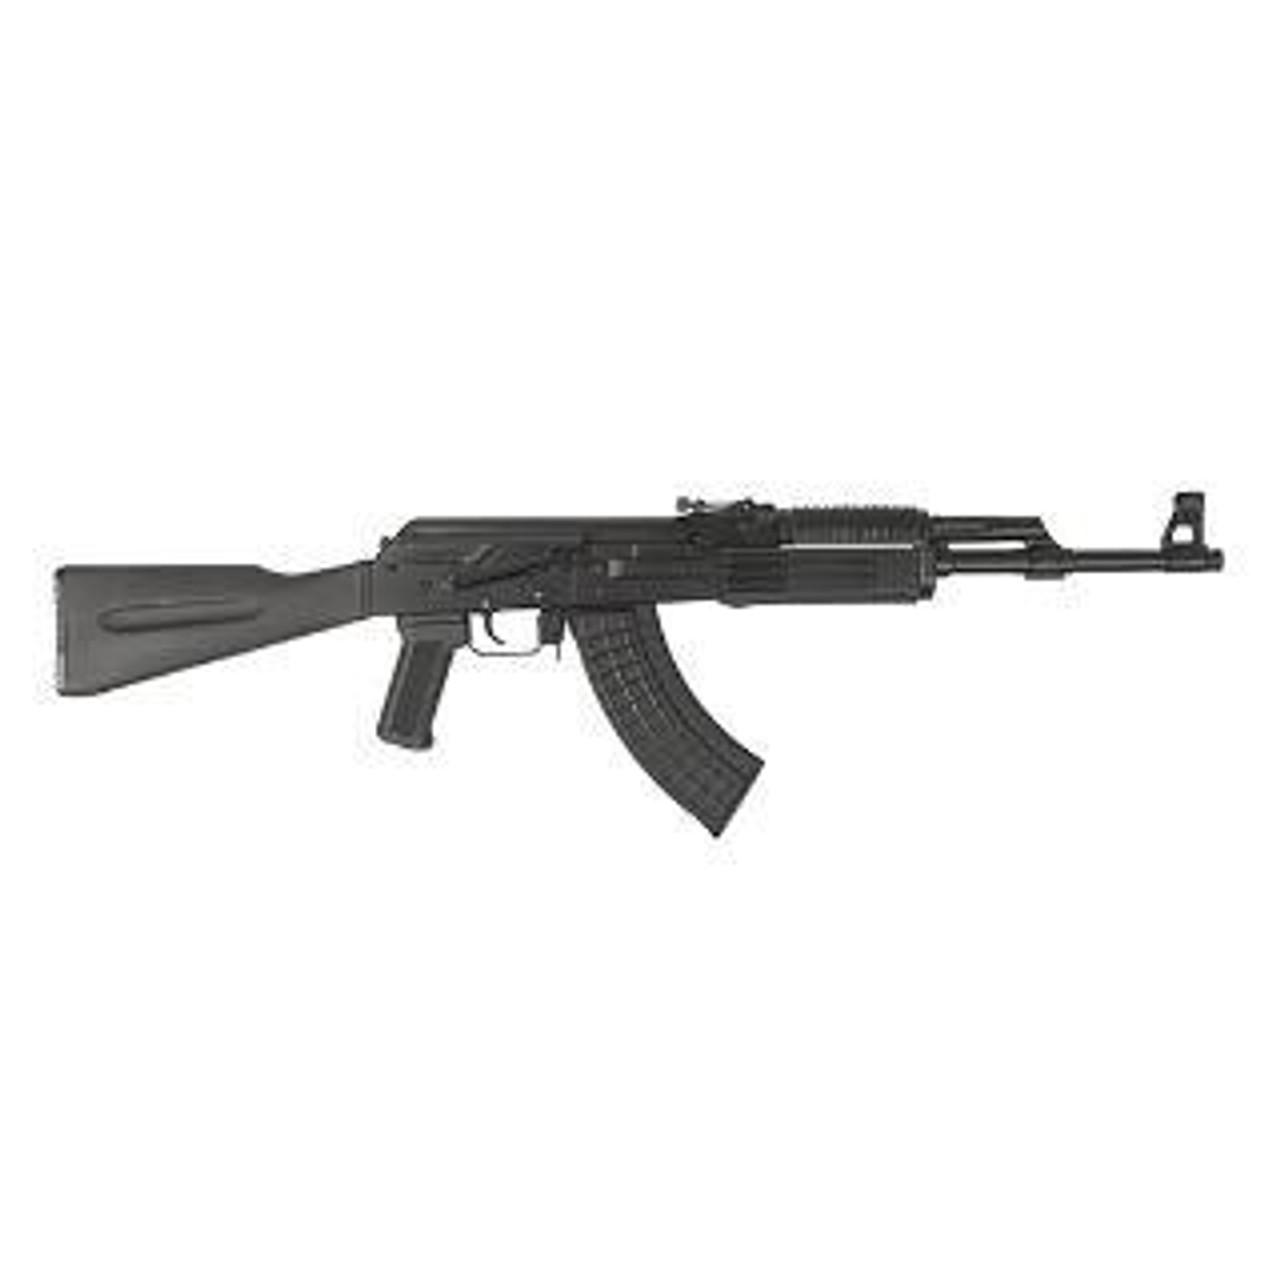 MOLOT VEPR AK-47 CALIFORNIA LEGAL- 7.62x39